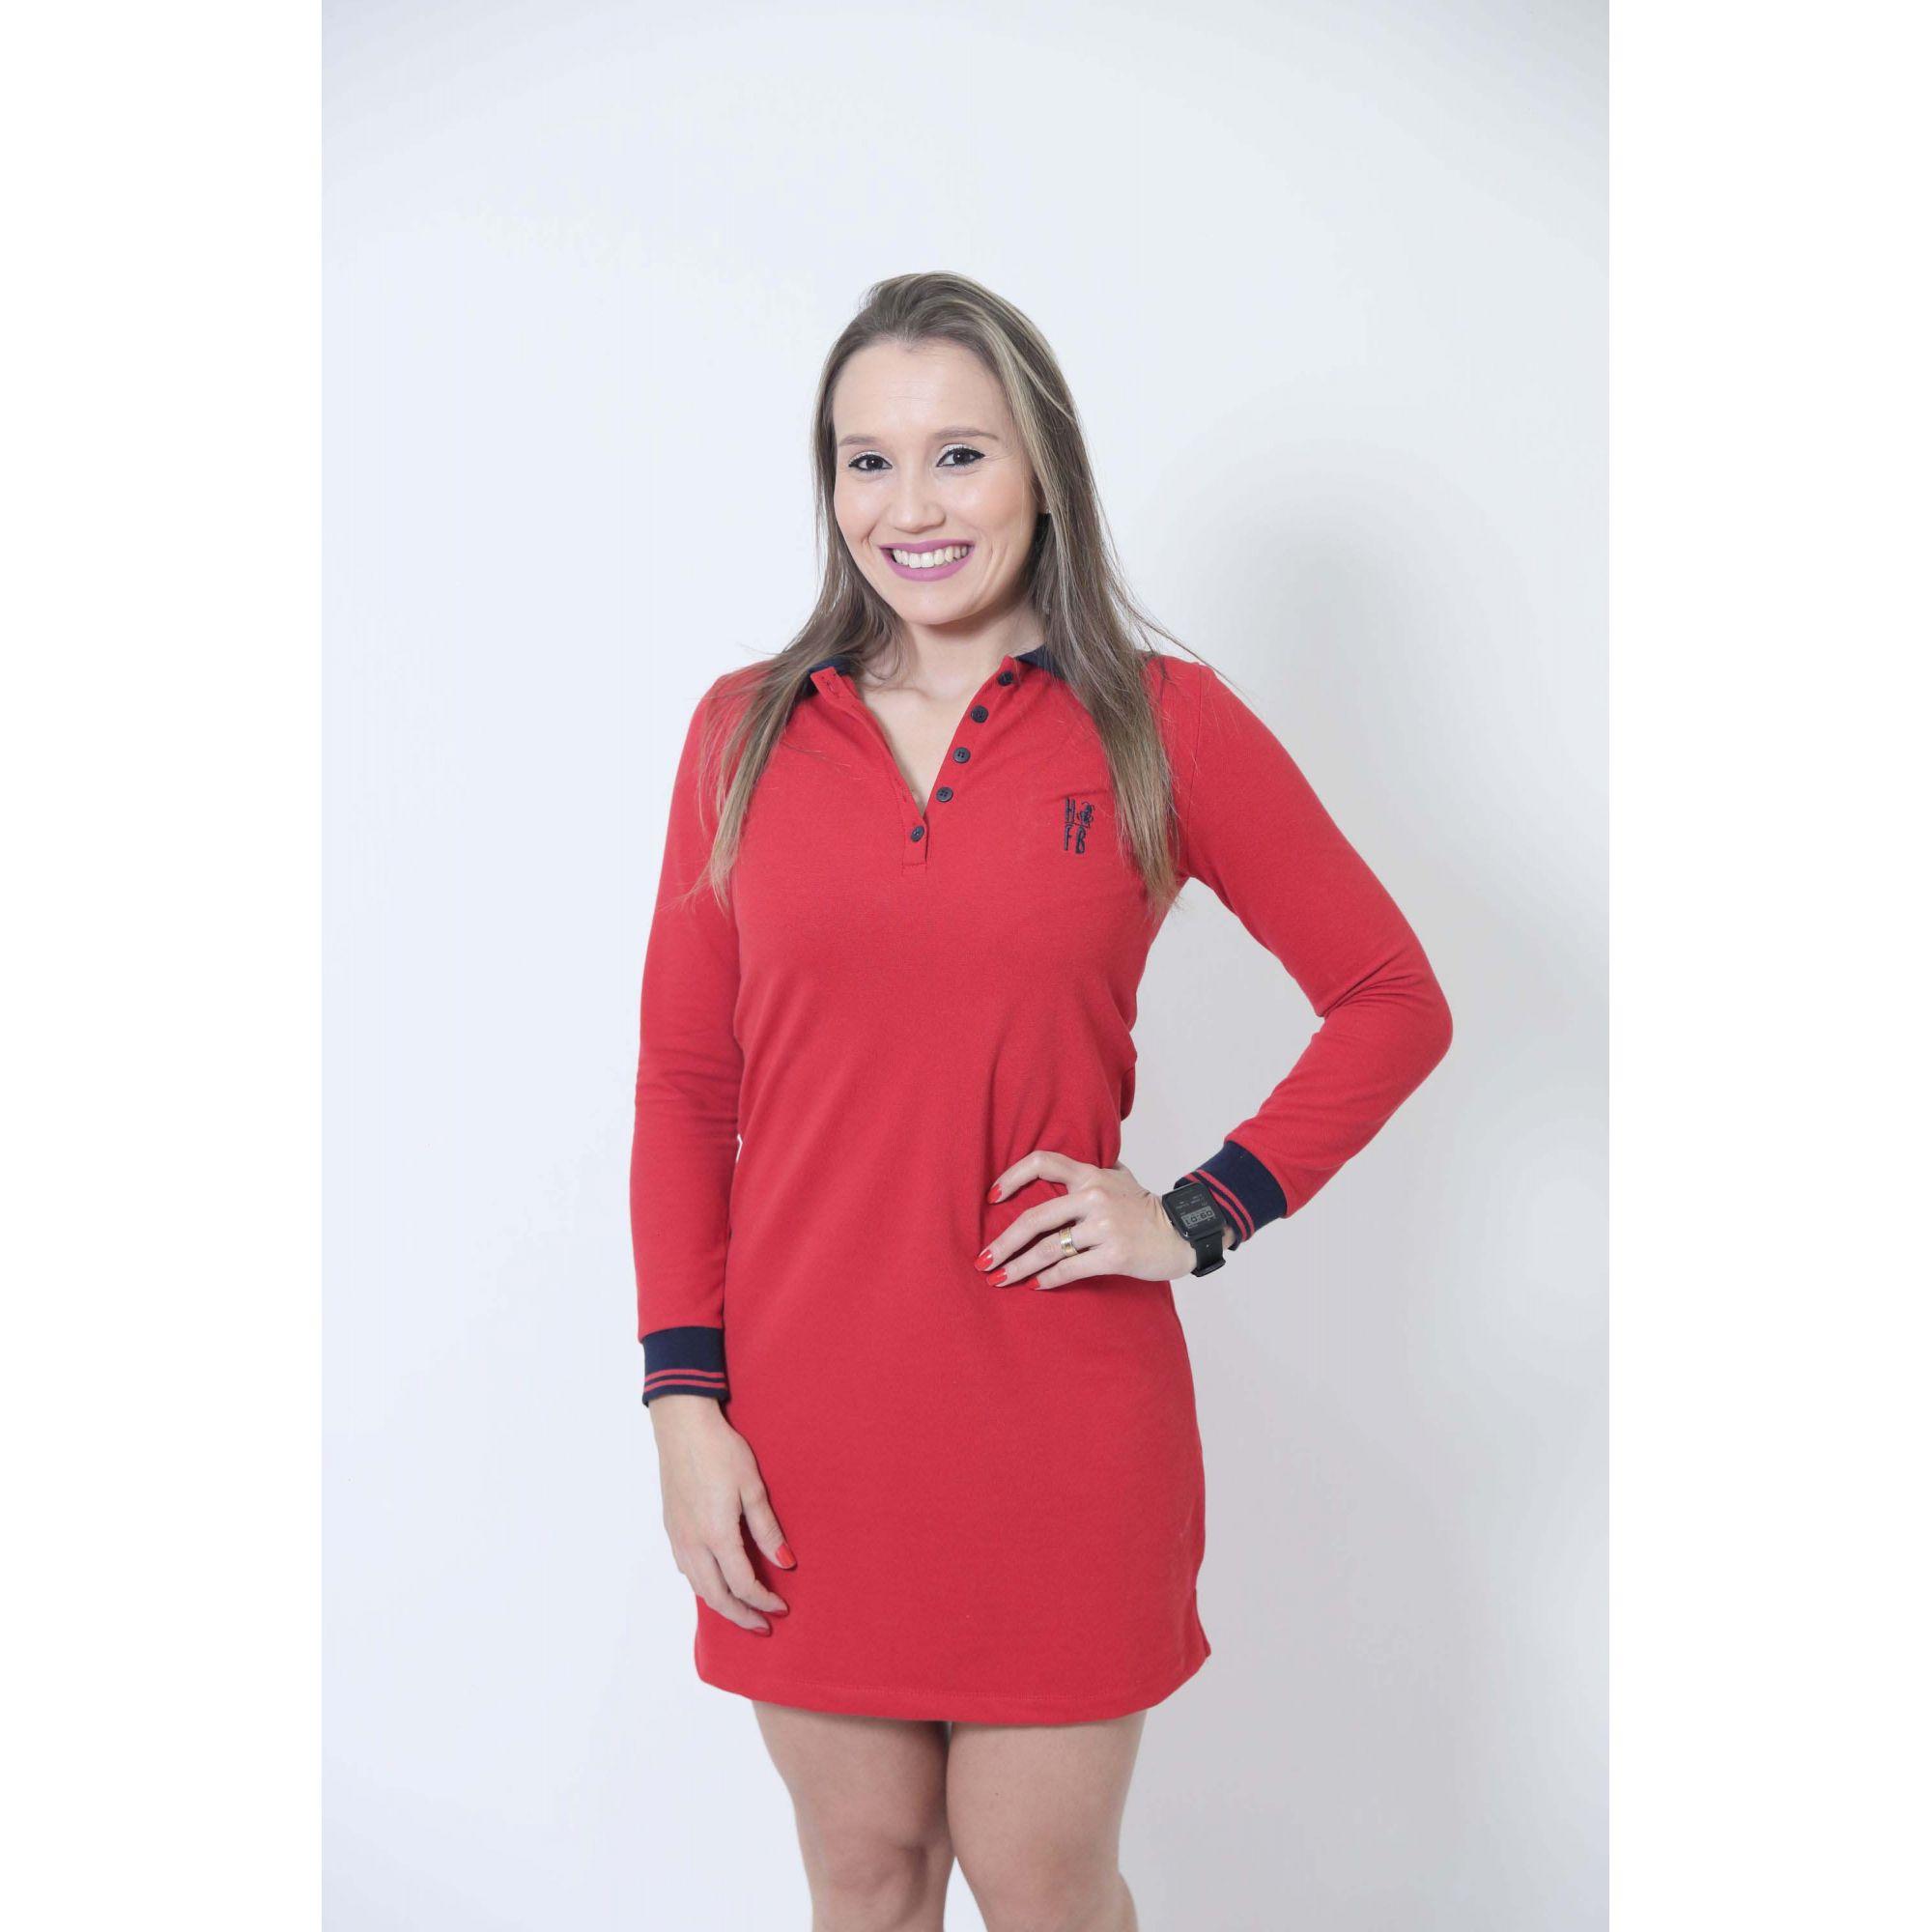 Vestido Polo Vermelho Manga Longa  - Heitor Fashion Brazil